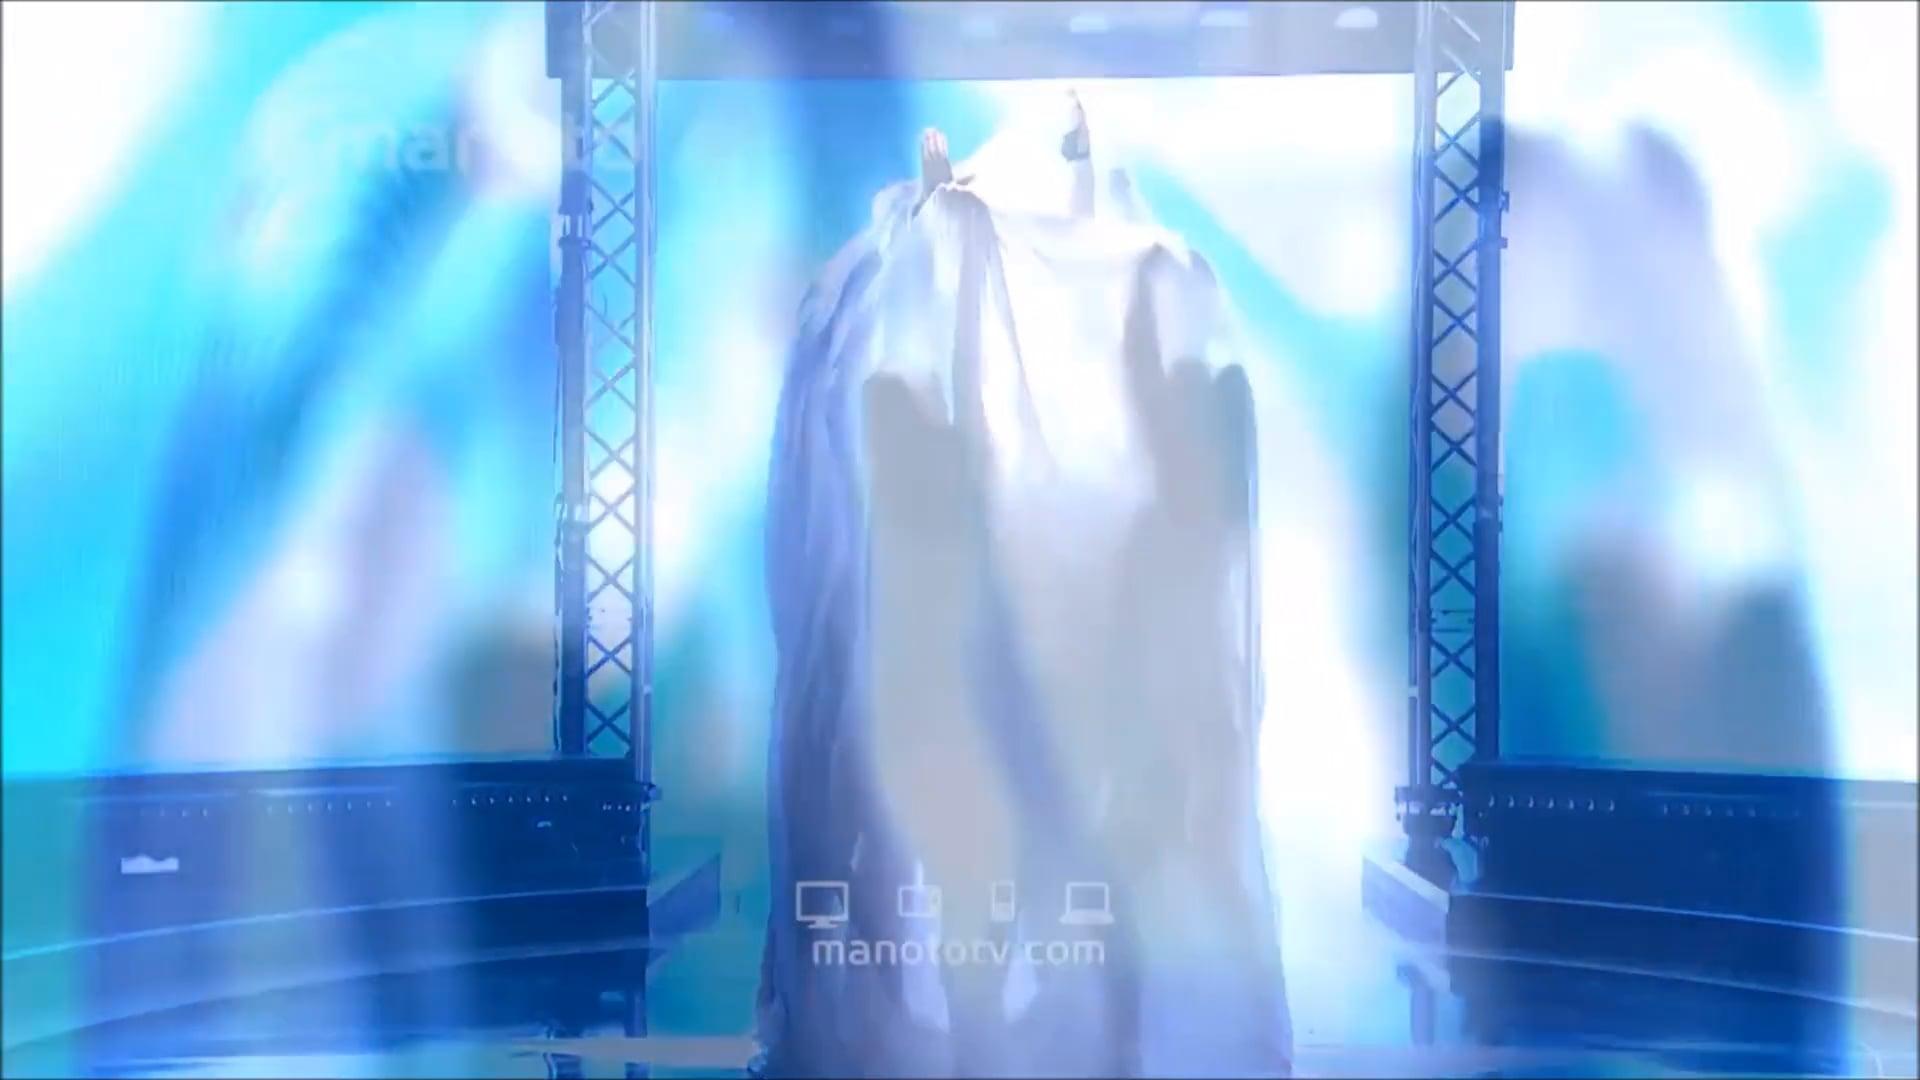 Gola Miri - The Stage Manoto TV